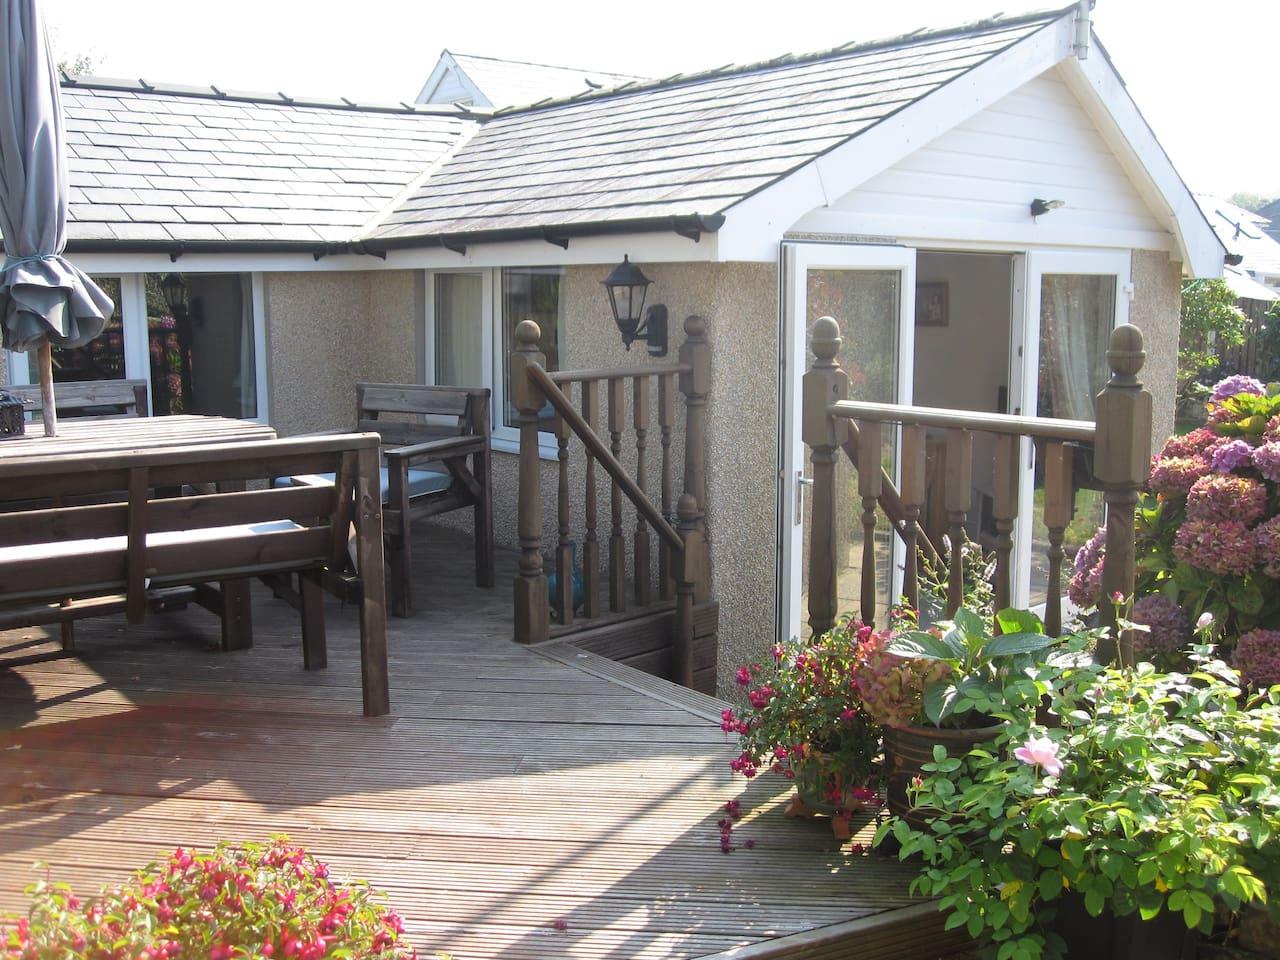 Sunny decking area